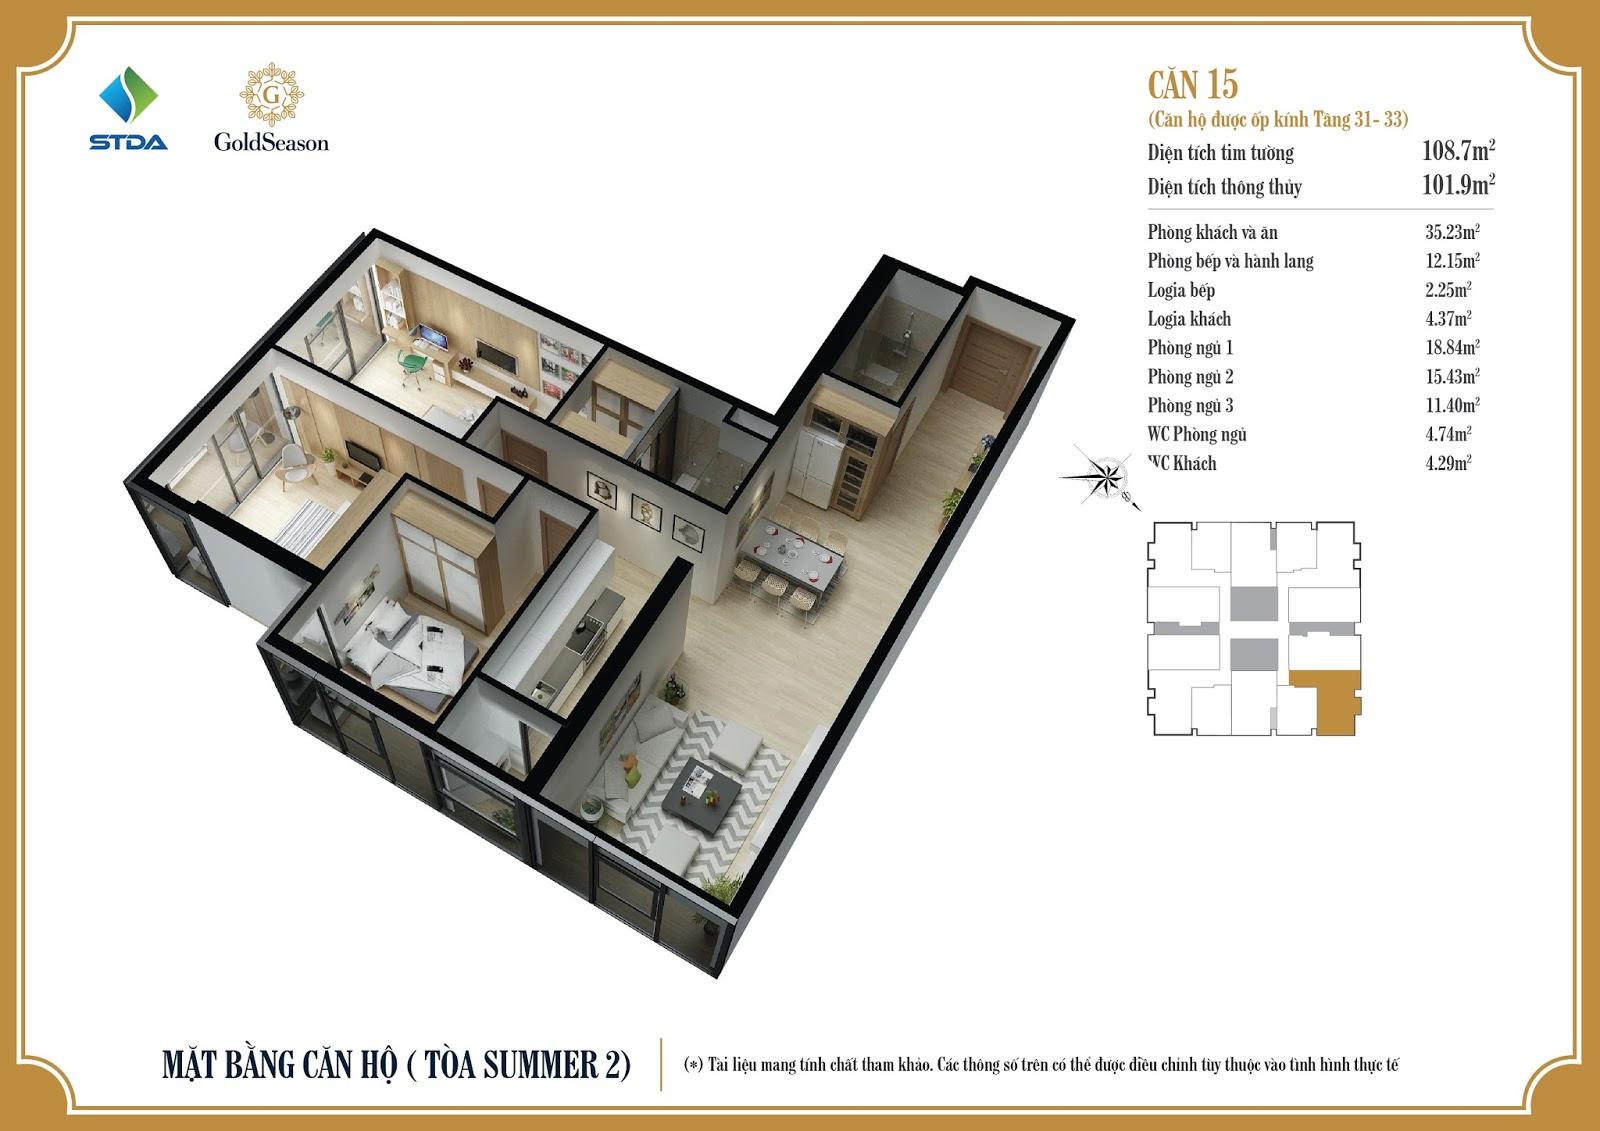 Mặt bằng căn hộ ốp kính 15 tầng 31-33 - GoldSeason